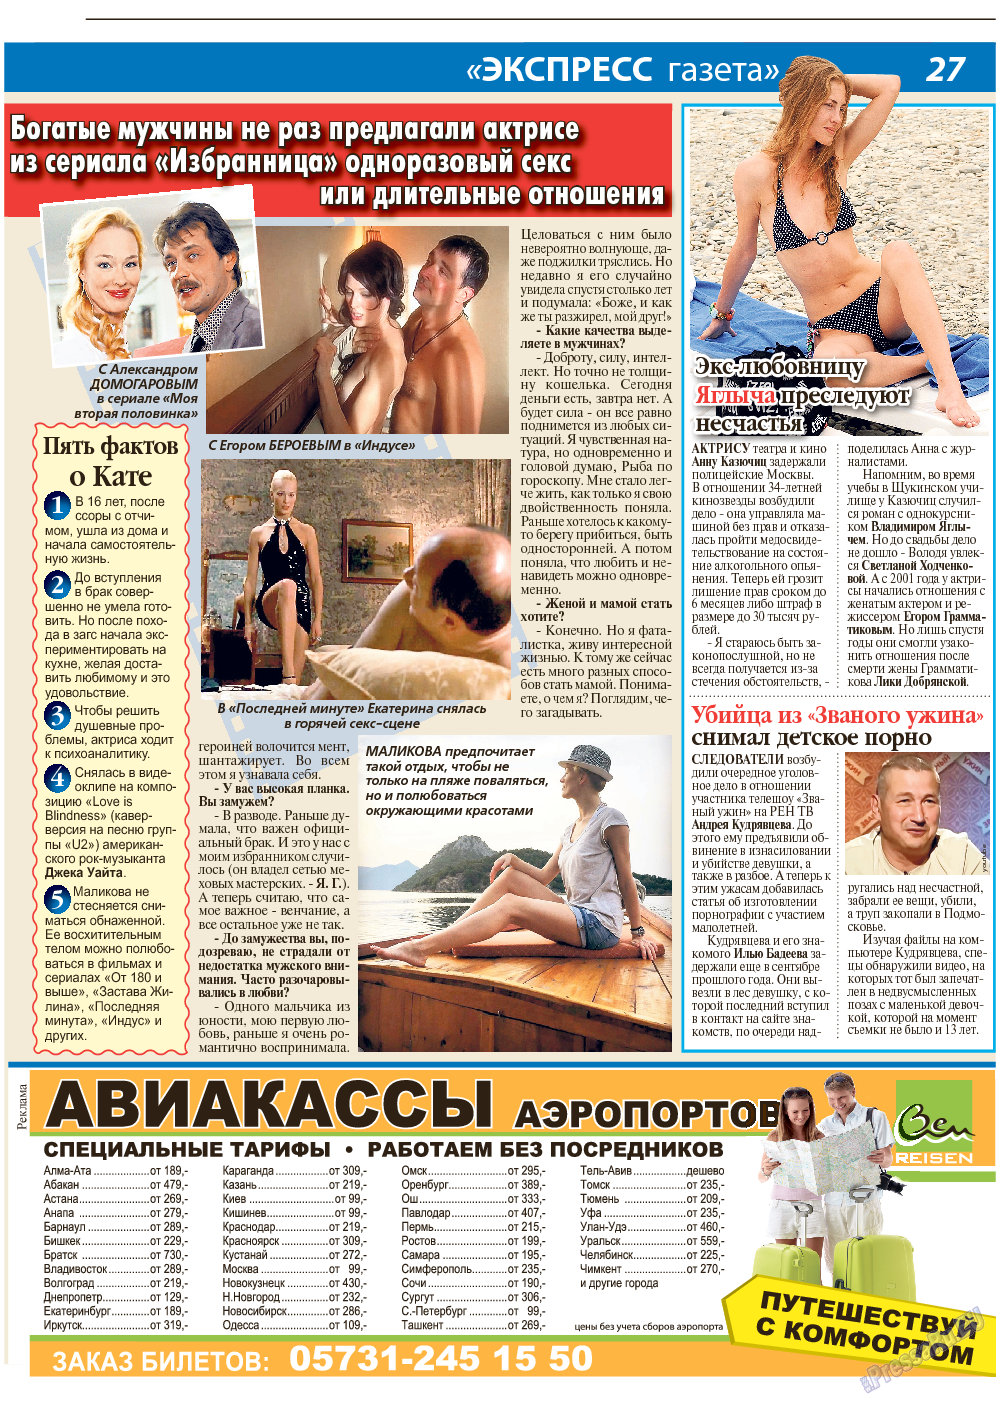 Экспресс газета (газета). 2017 год, номер 11, стр. 27